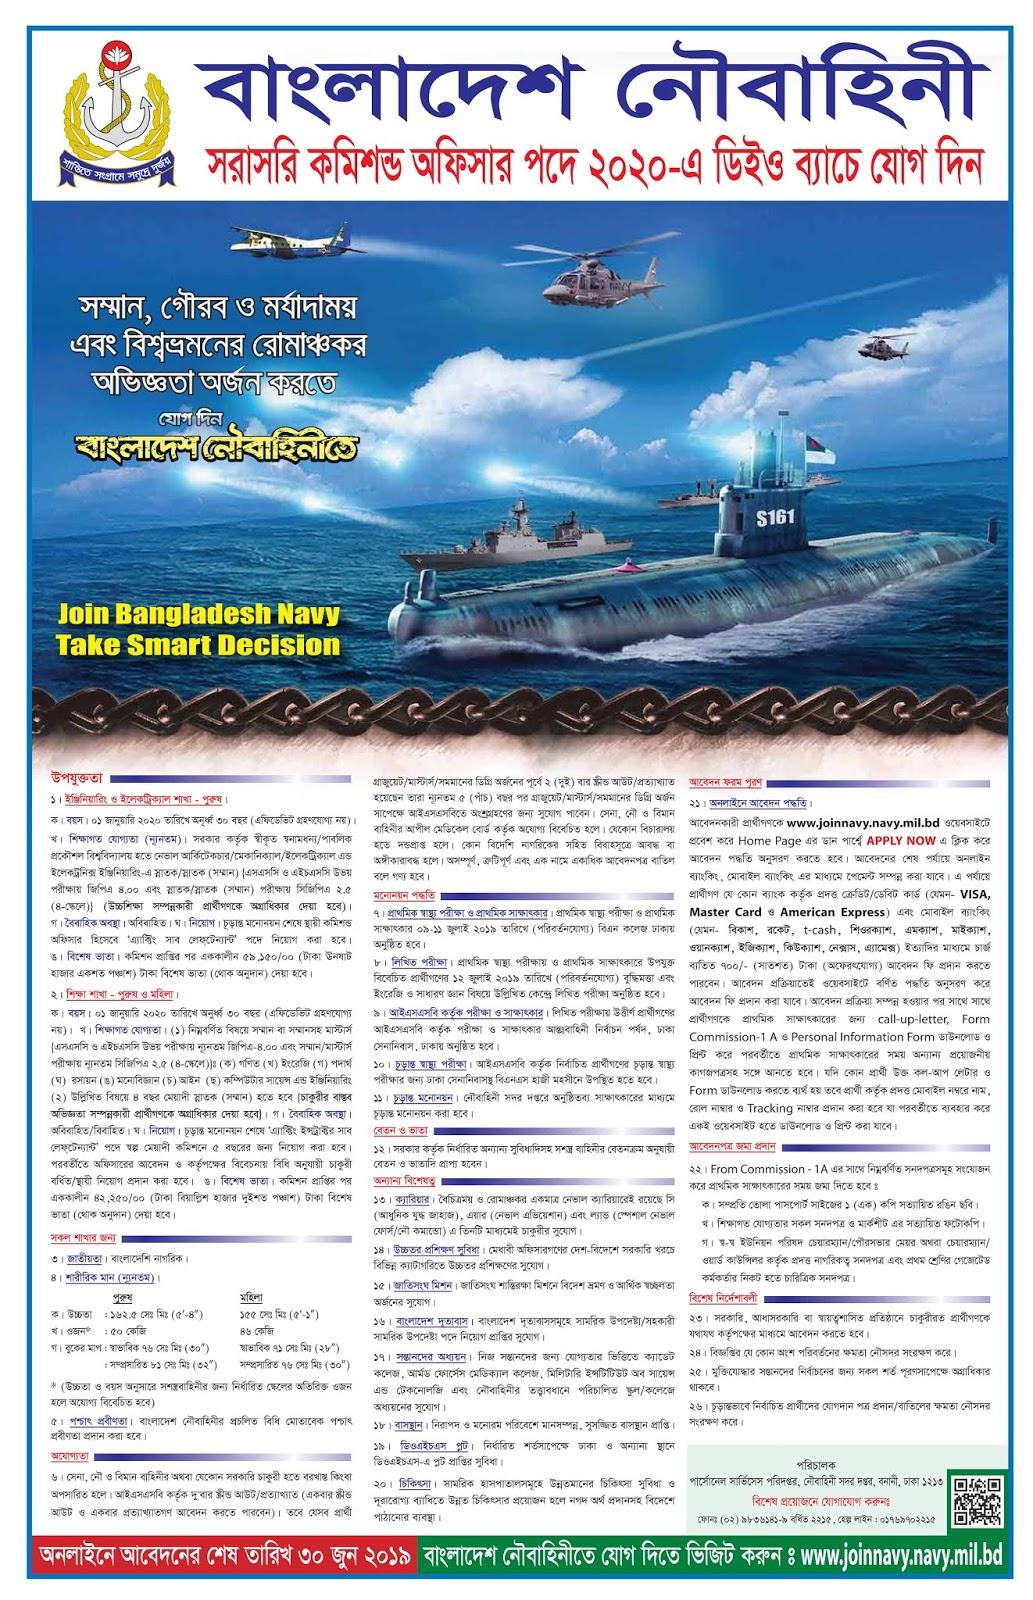 Bangladesh Navy Job Circular,2019-2020.www.newbdjob.com